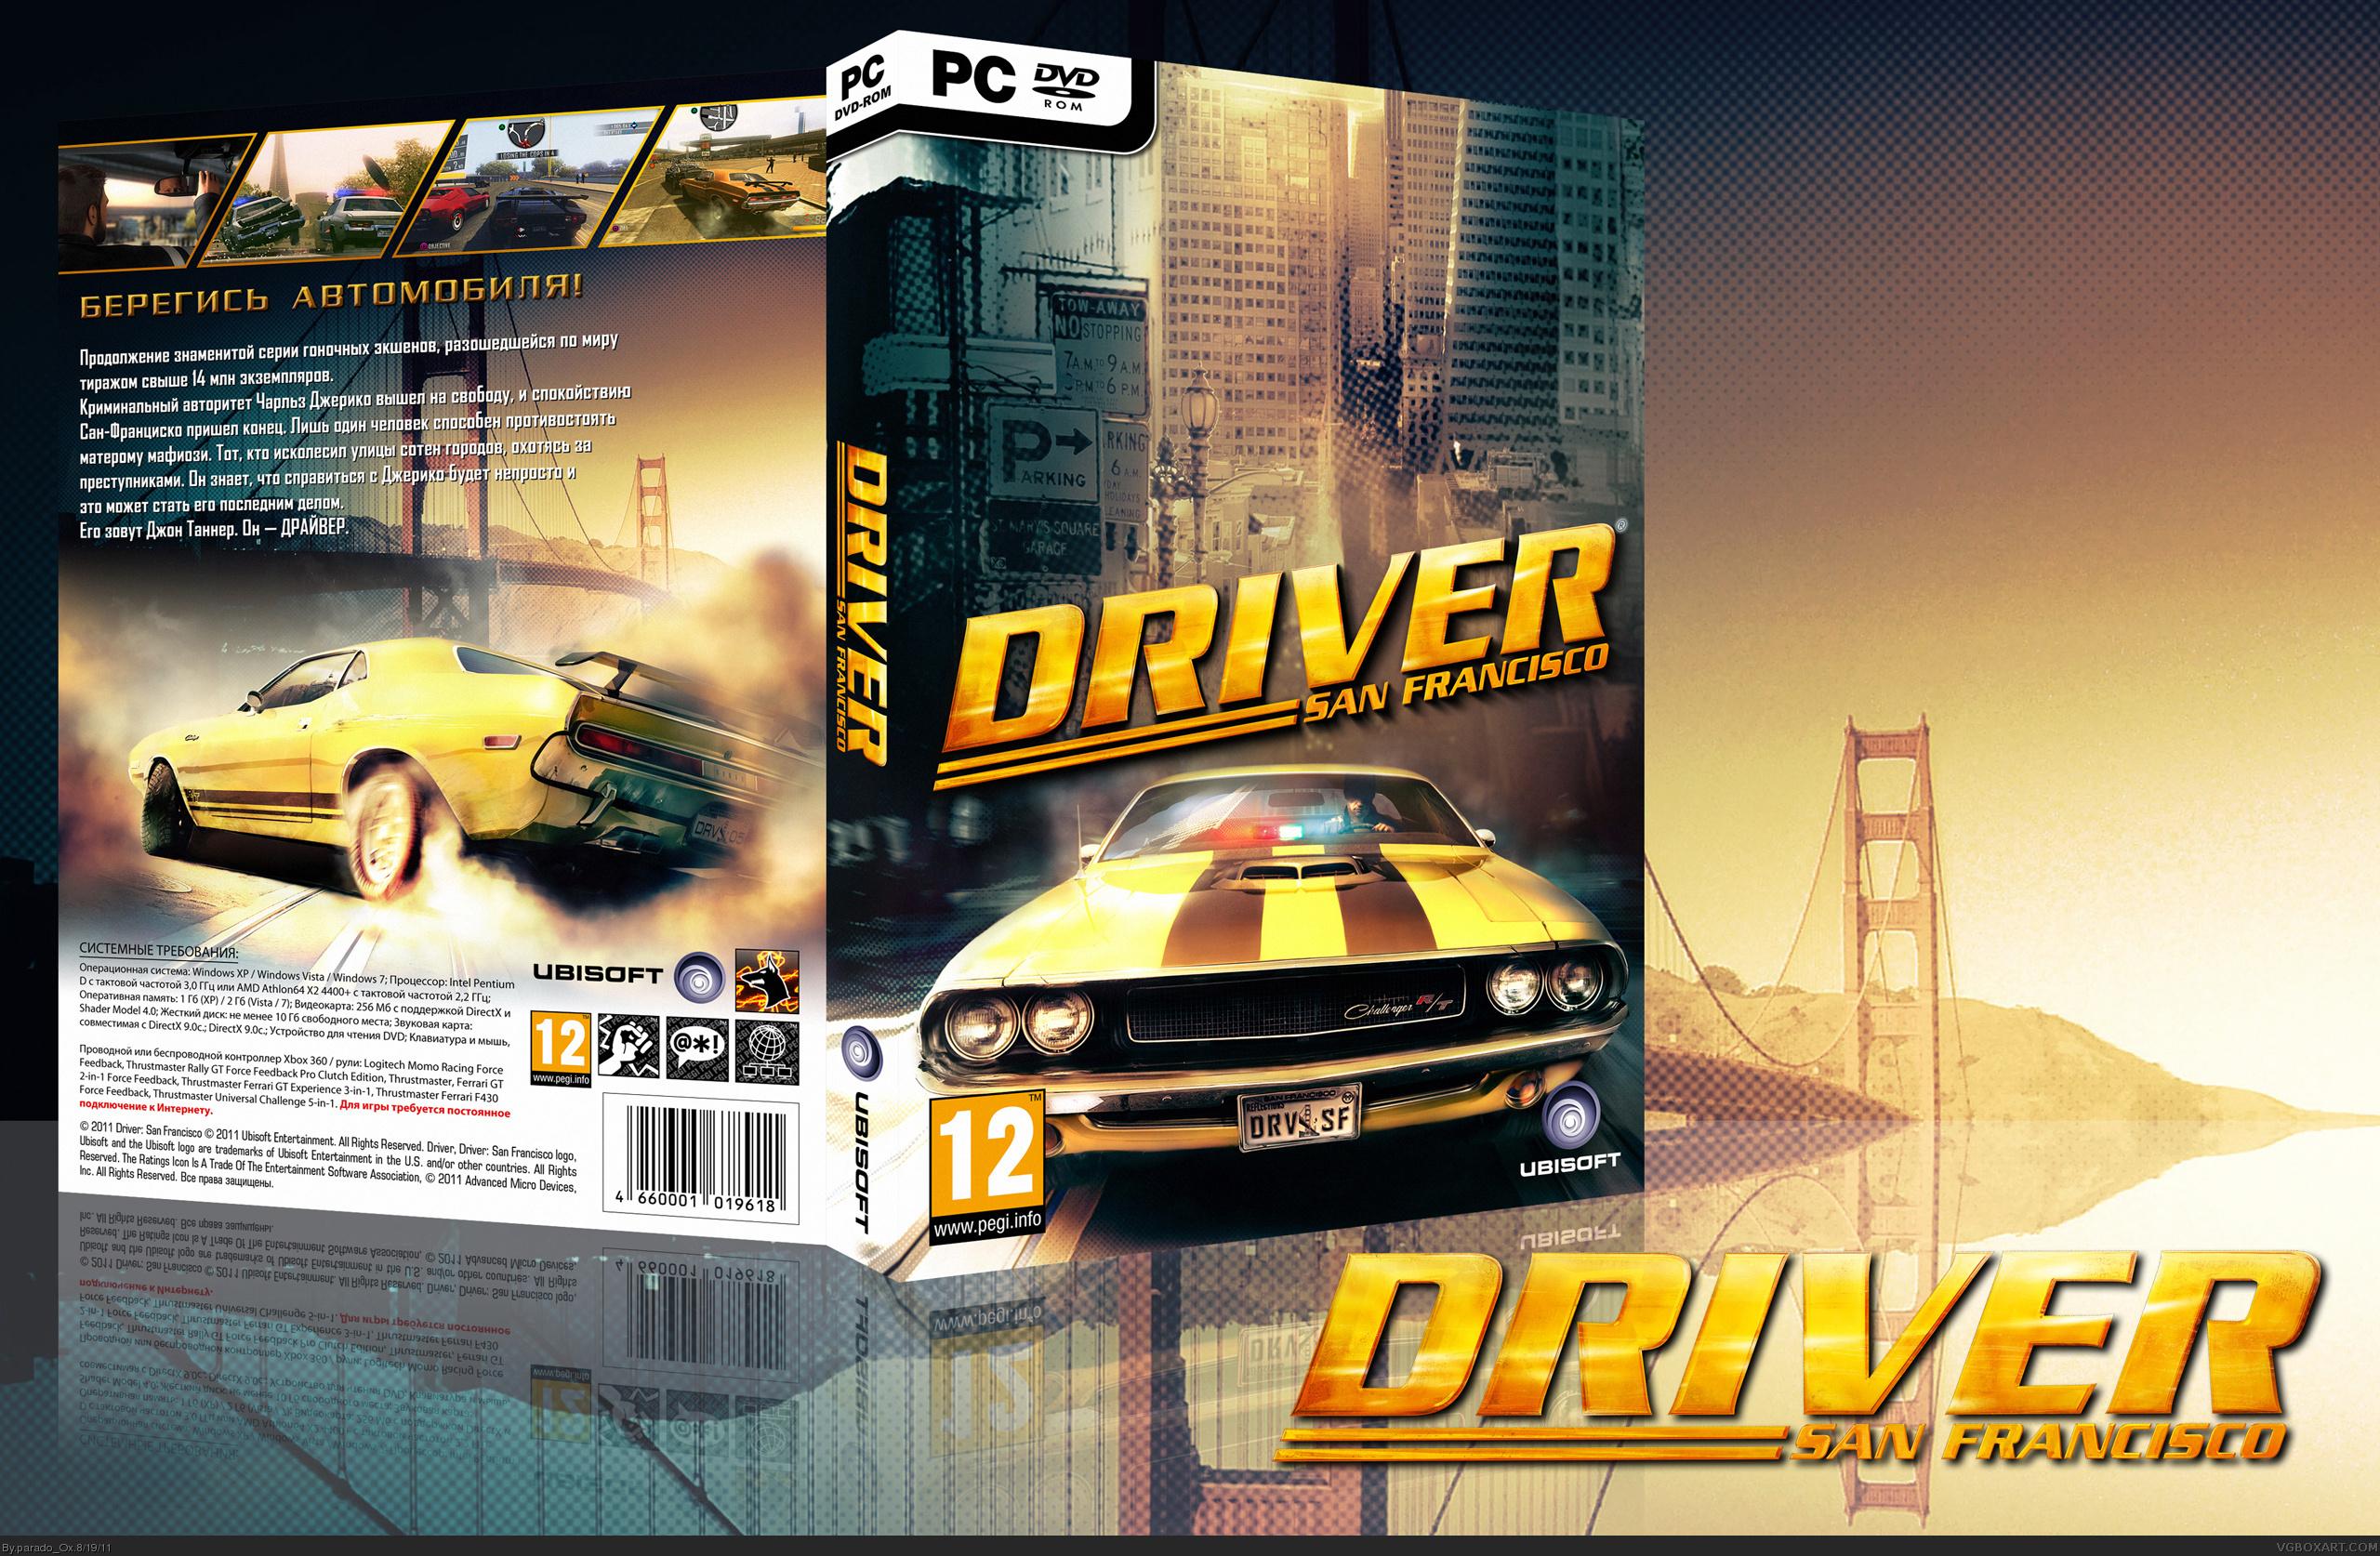 Driver San Francisco PC Box Art Cover by parado_Ox